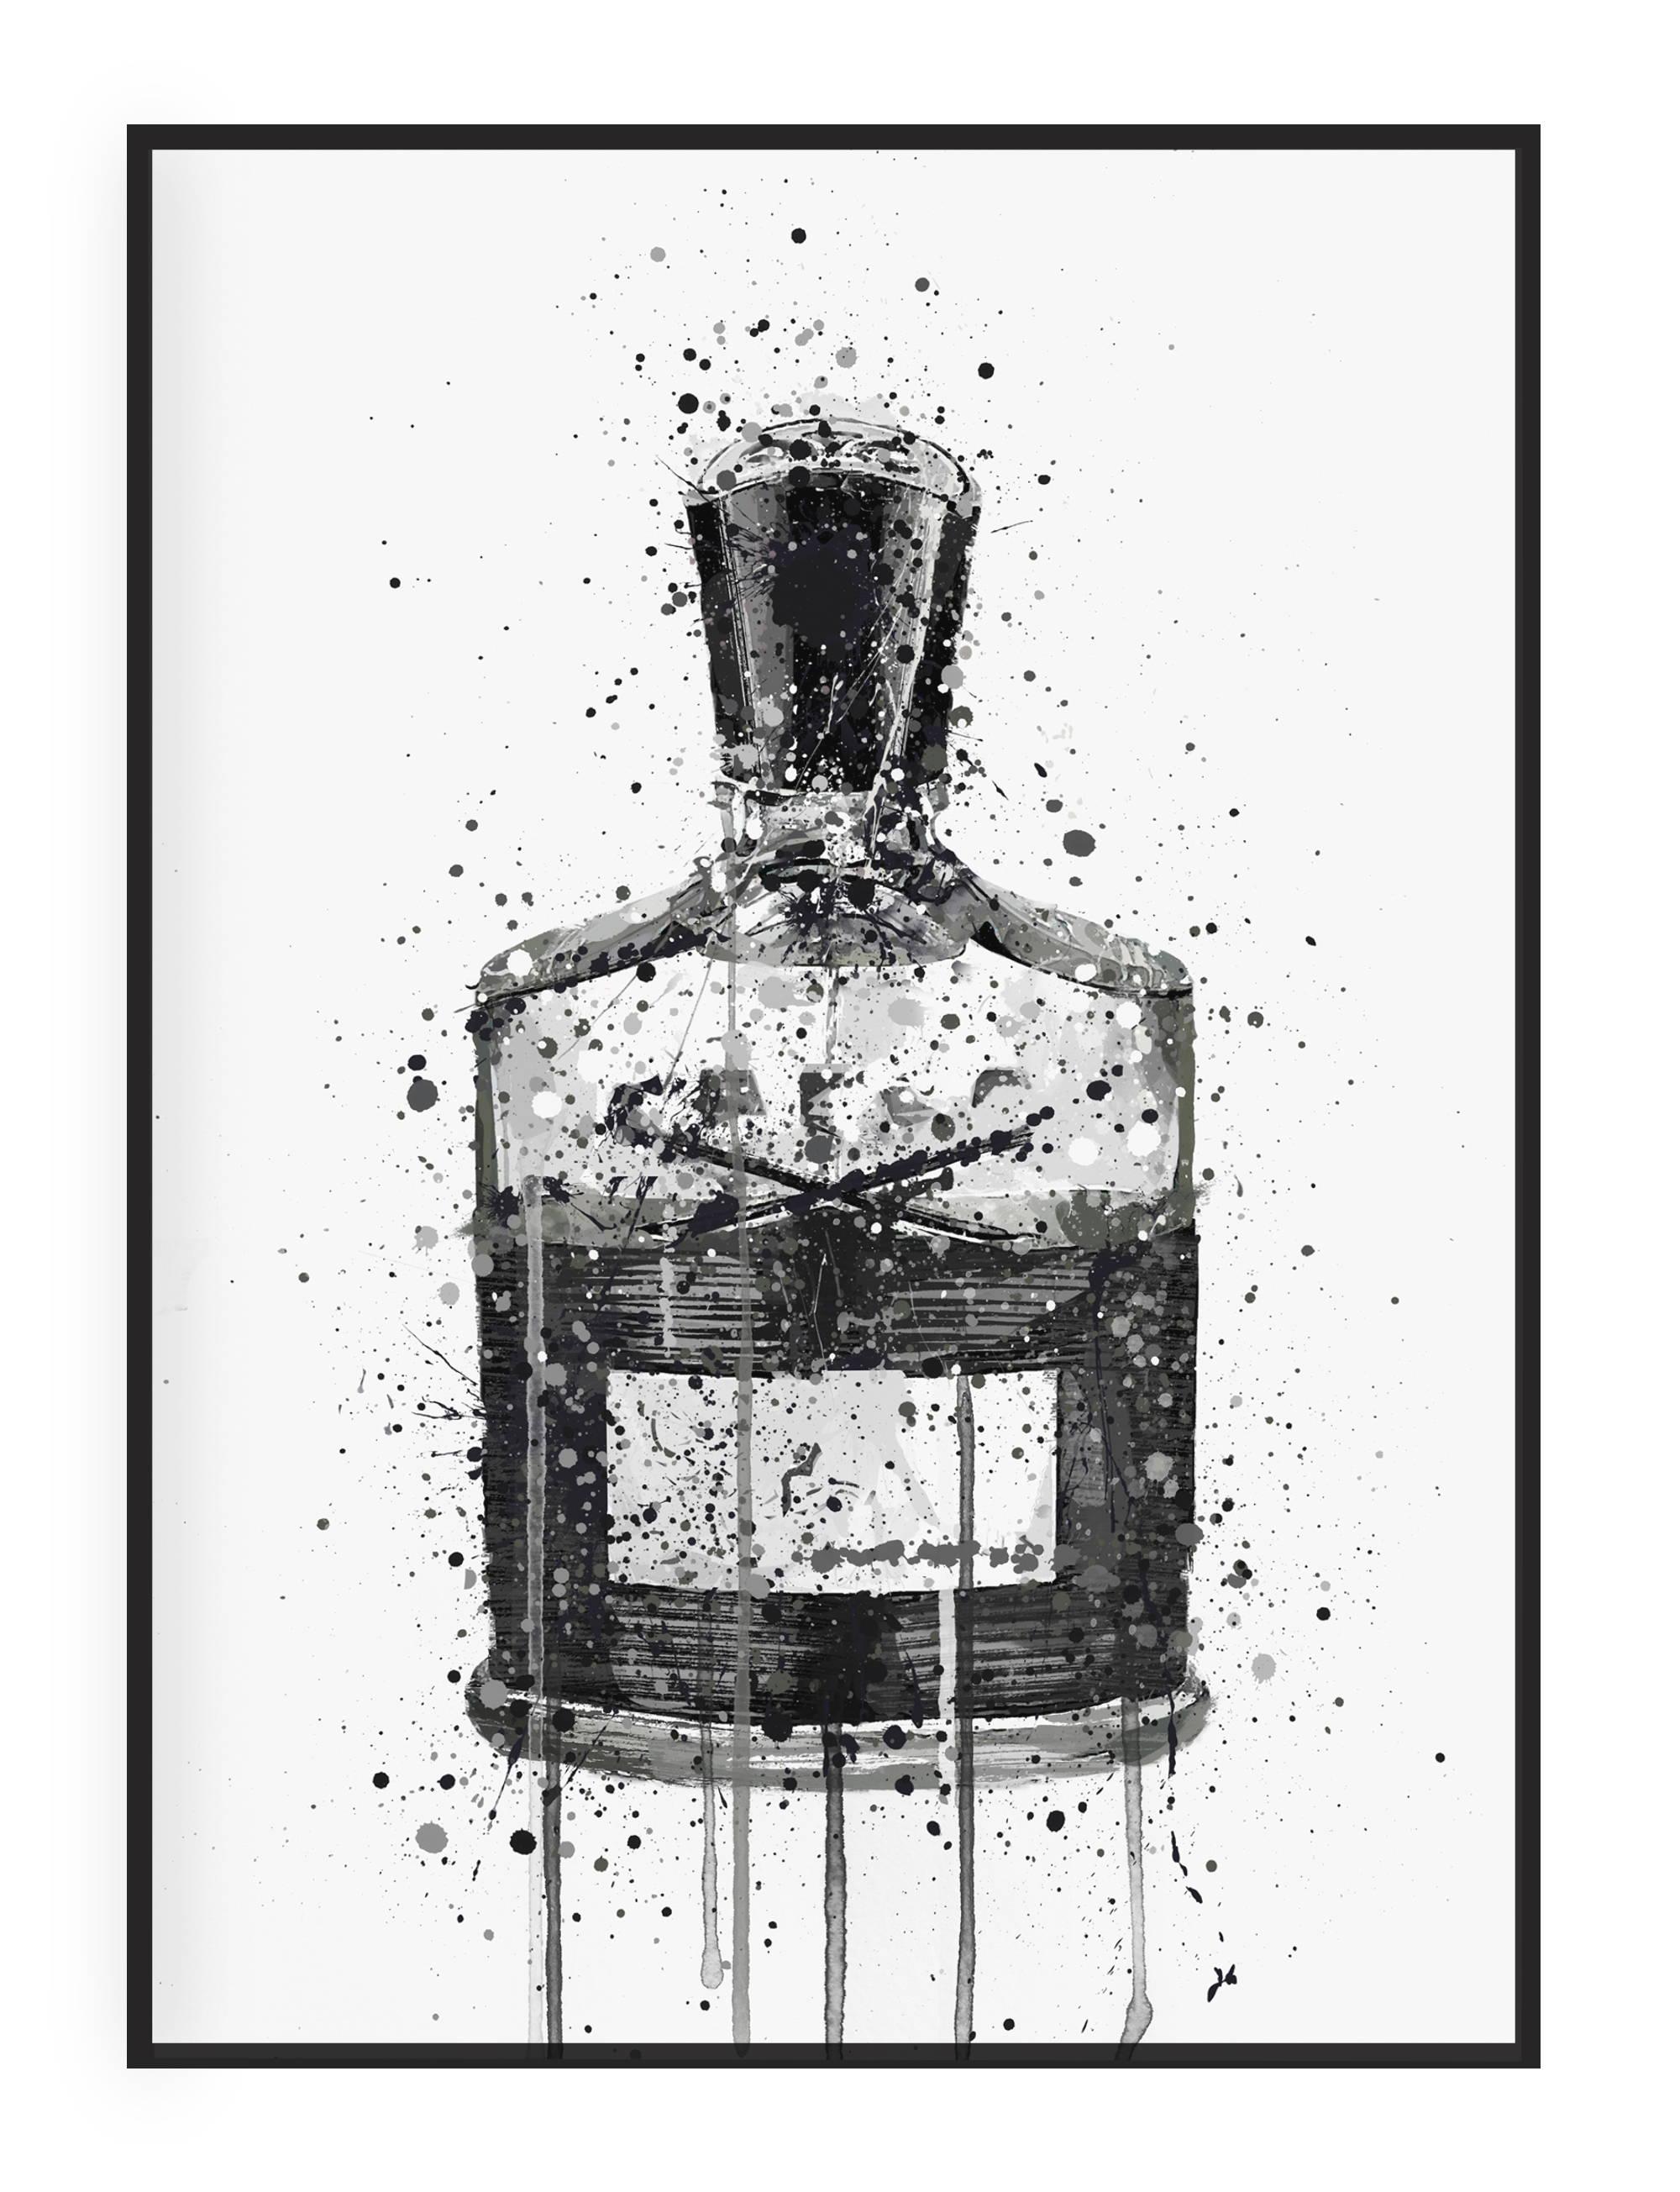 Men's Aftershave Wall Art Print Illustration